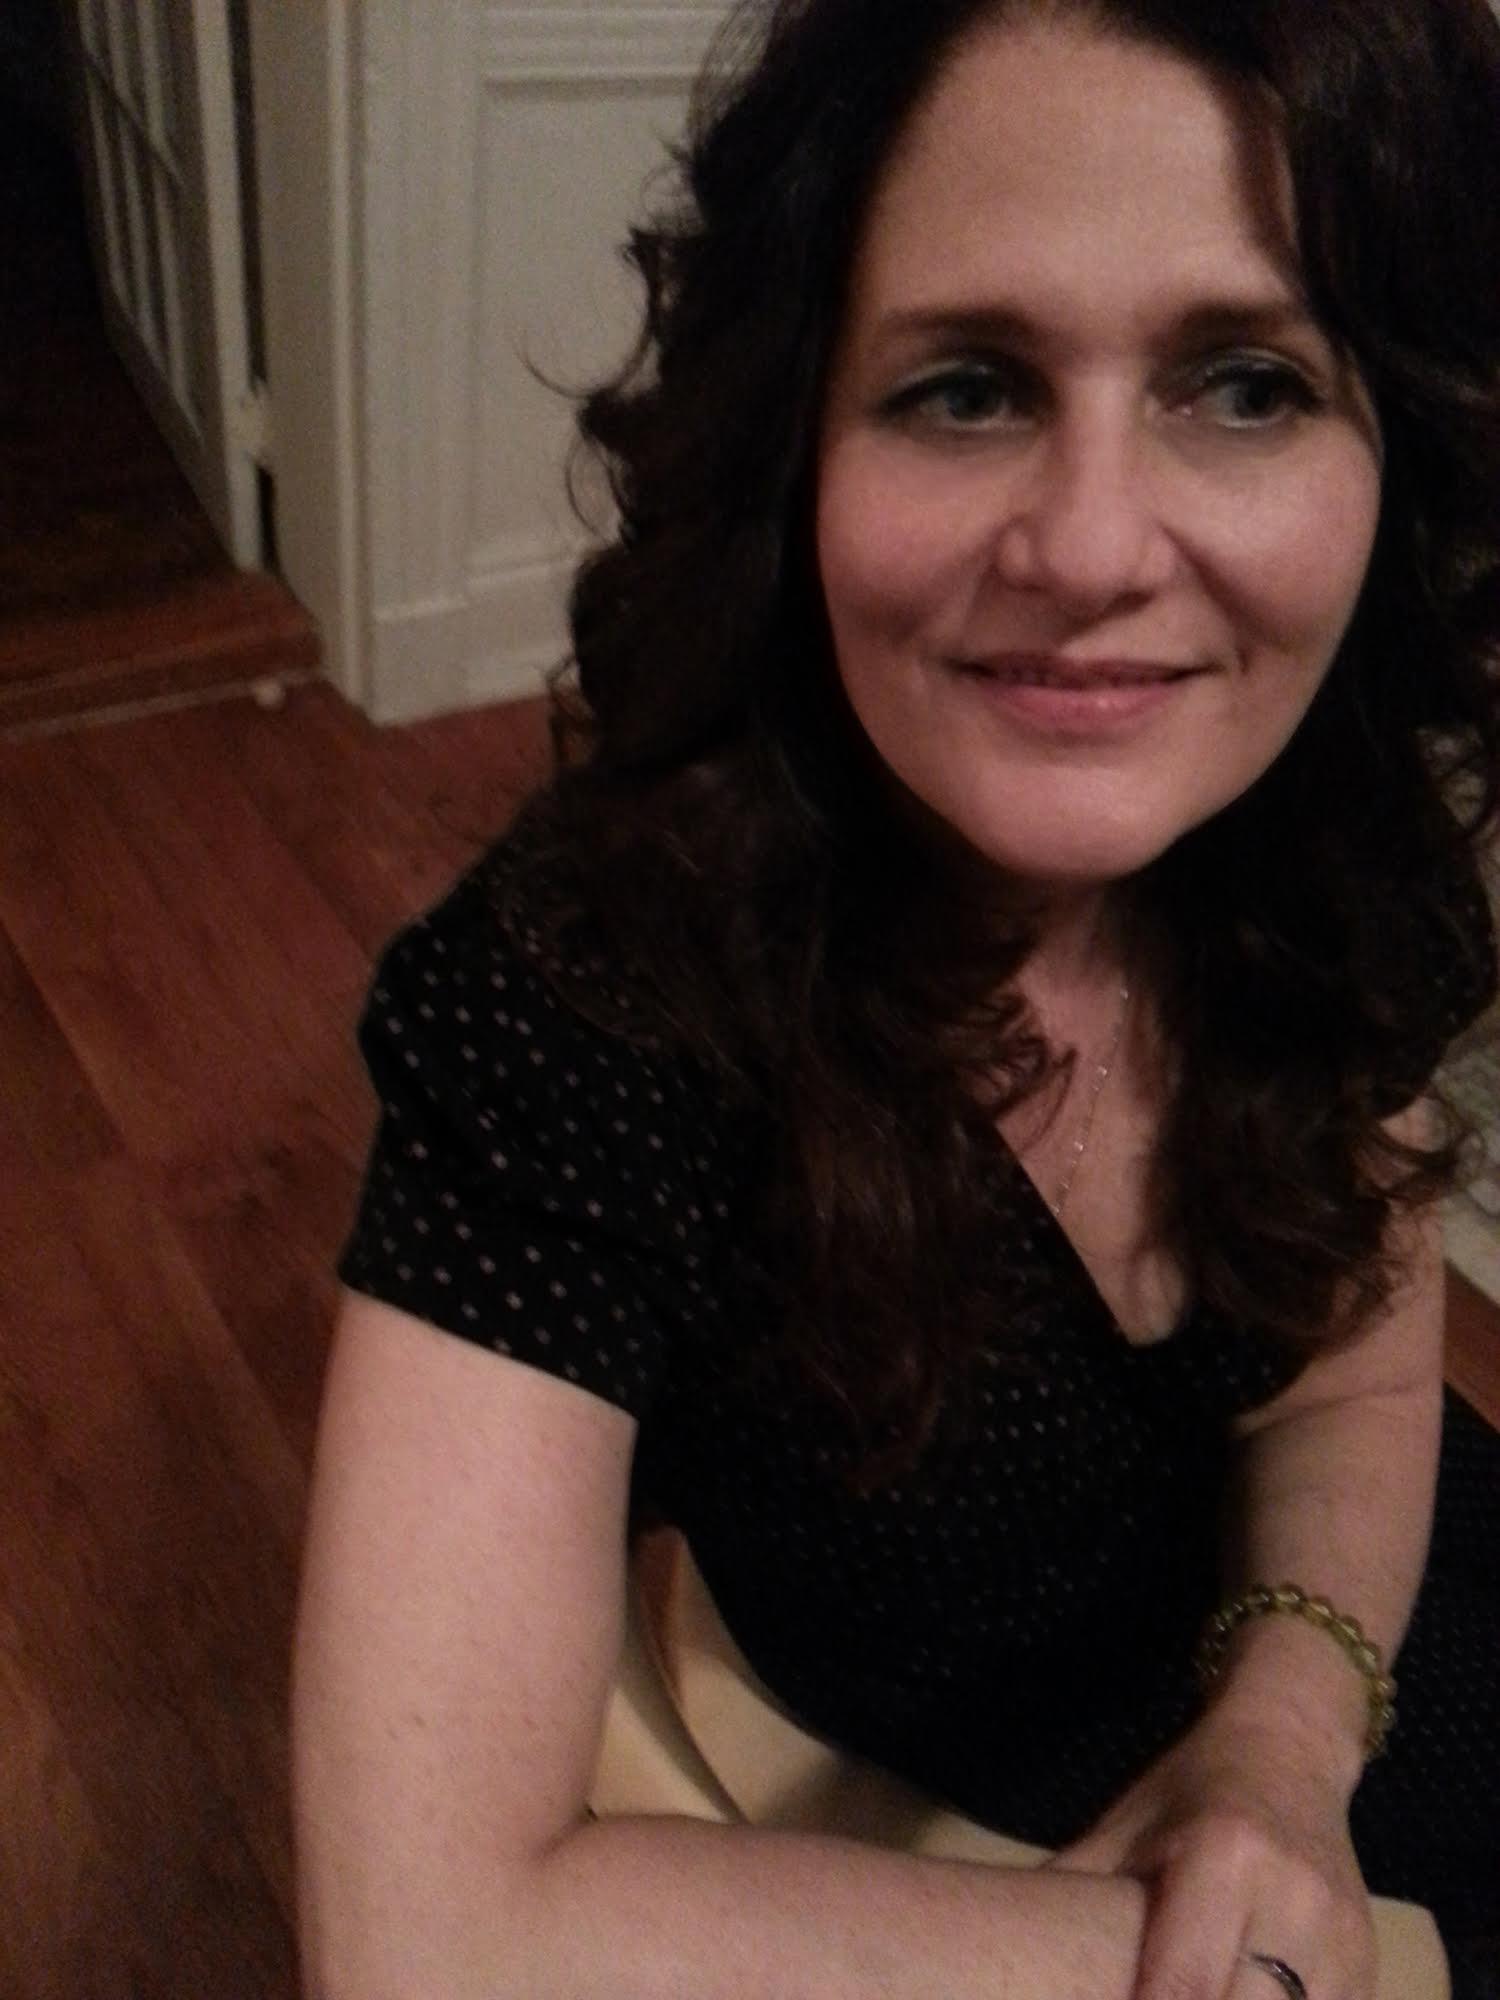 2016 ISA Fellow Rachel Liebling